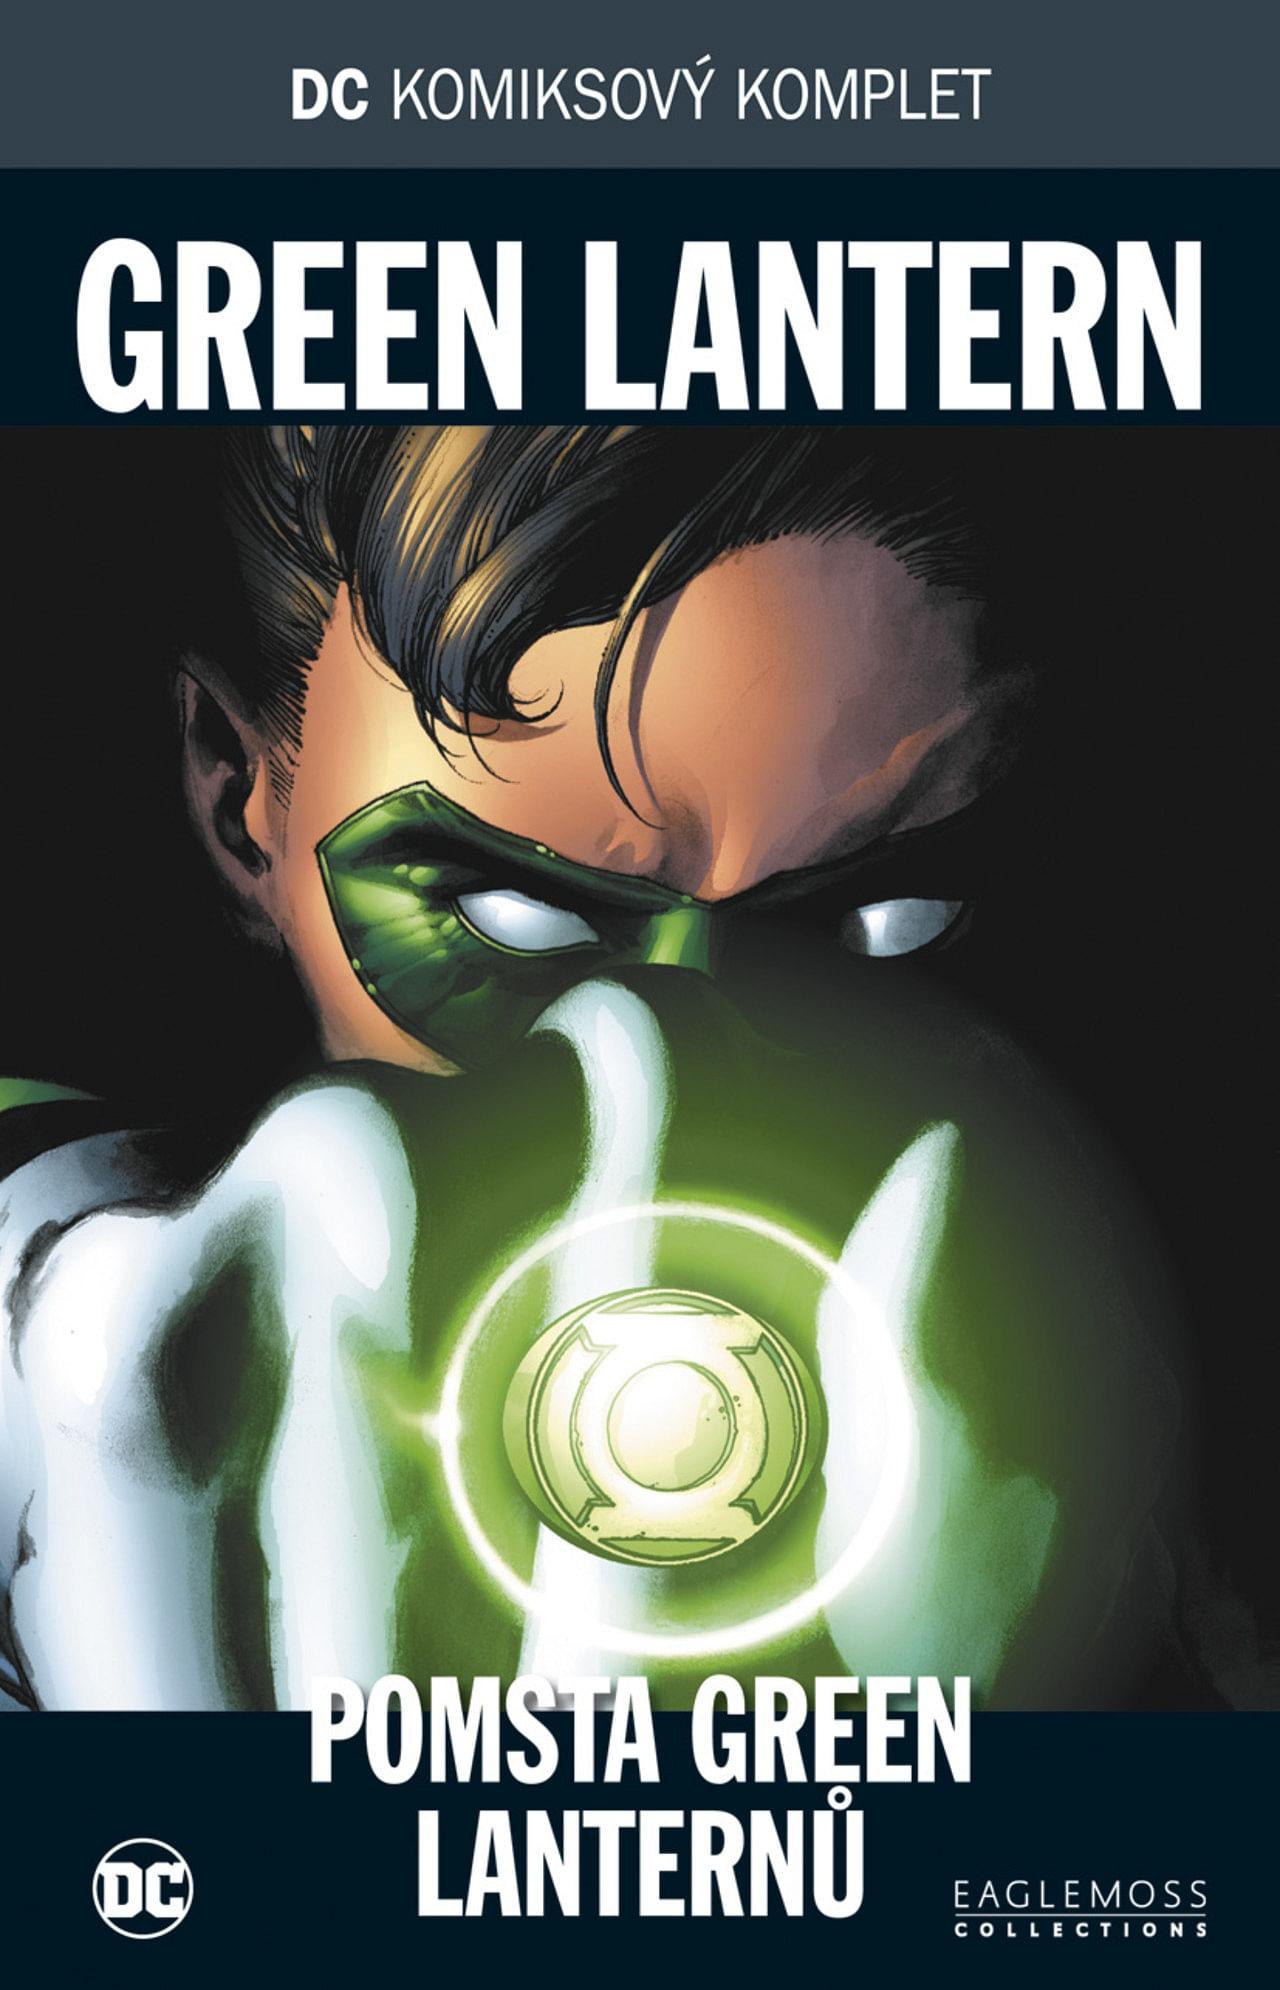 DC Komiksový komplet 79 - Green Lantern: Pomsta Green Lanternů